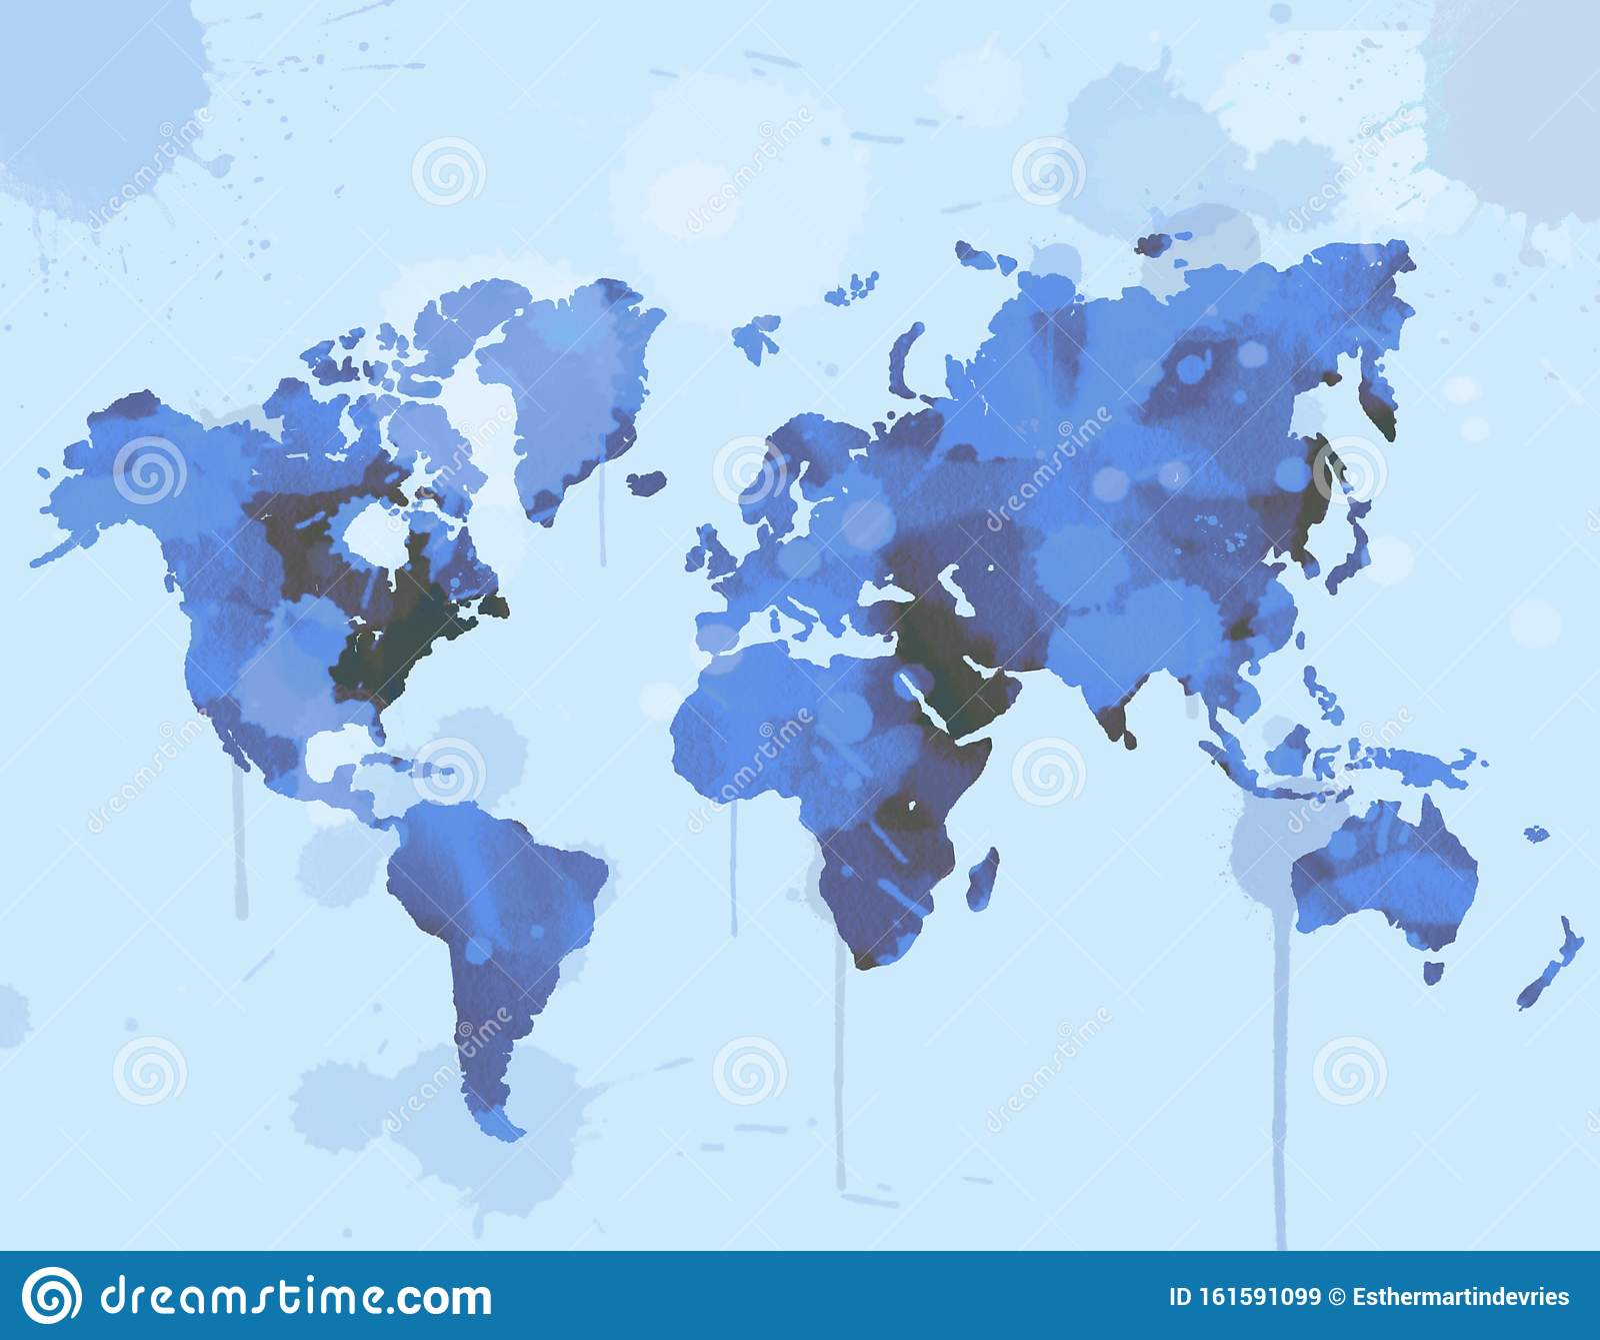 World Map Illustration In Watercolor Stock Illustration